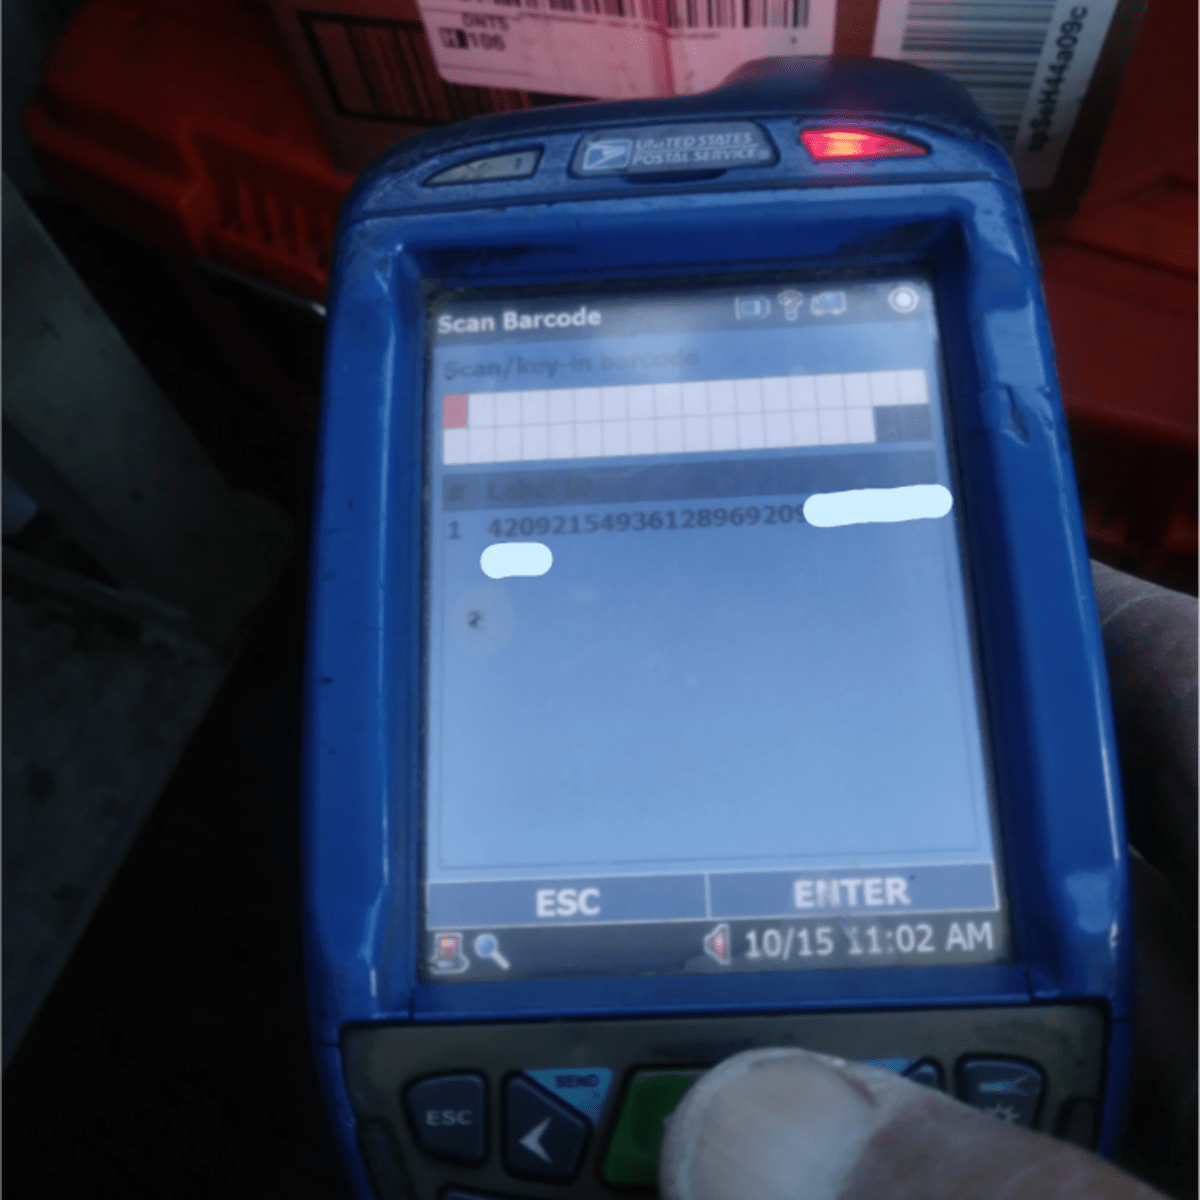 postal mdd scanner tips and tricks for